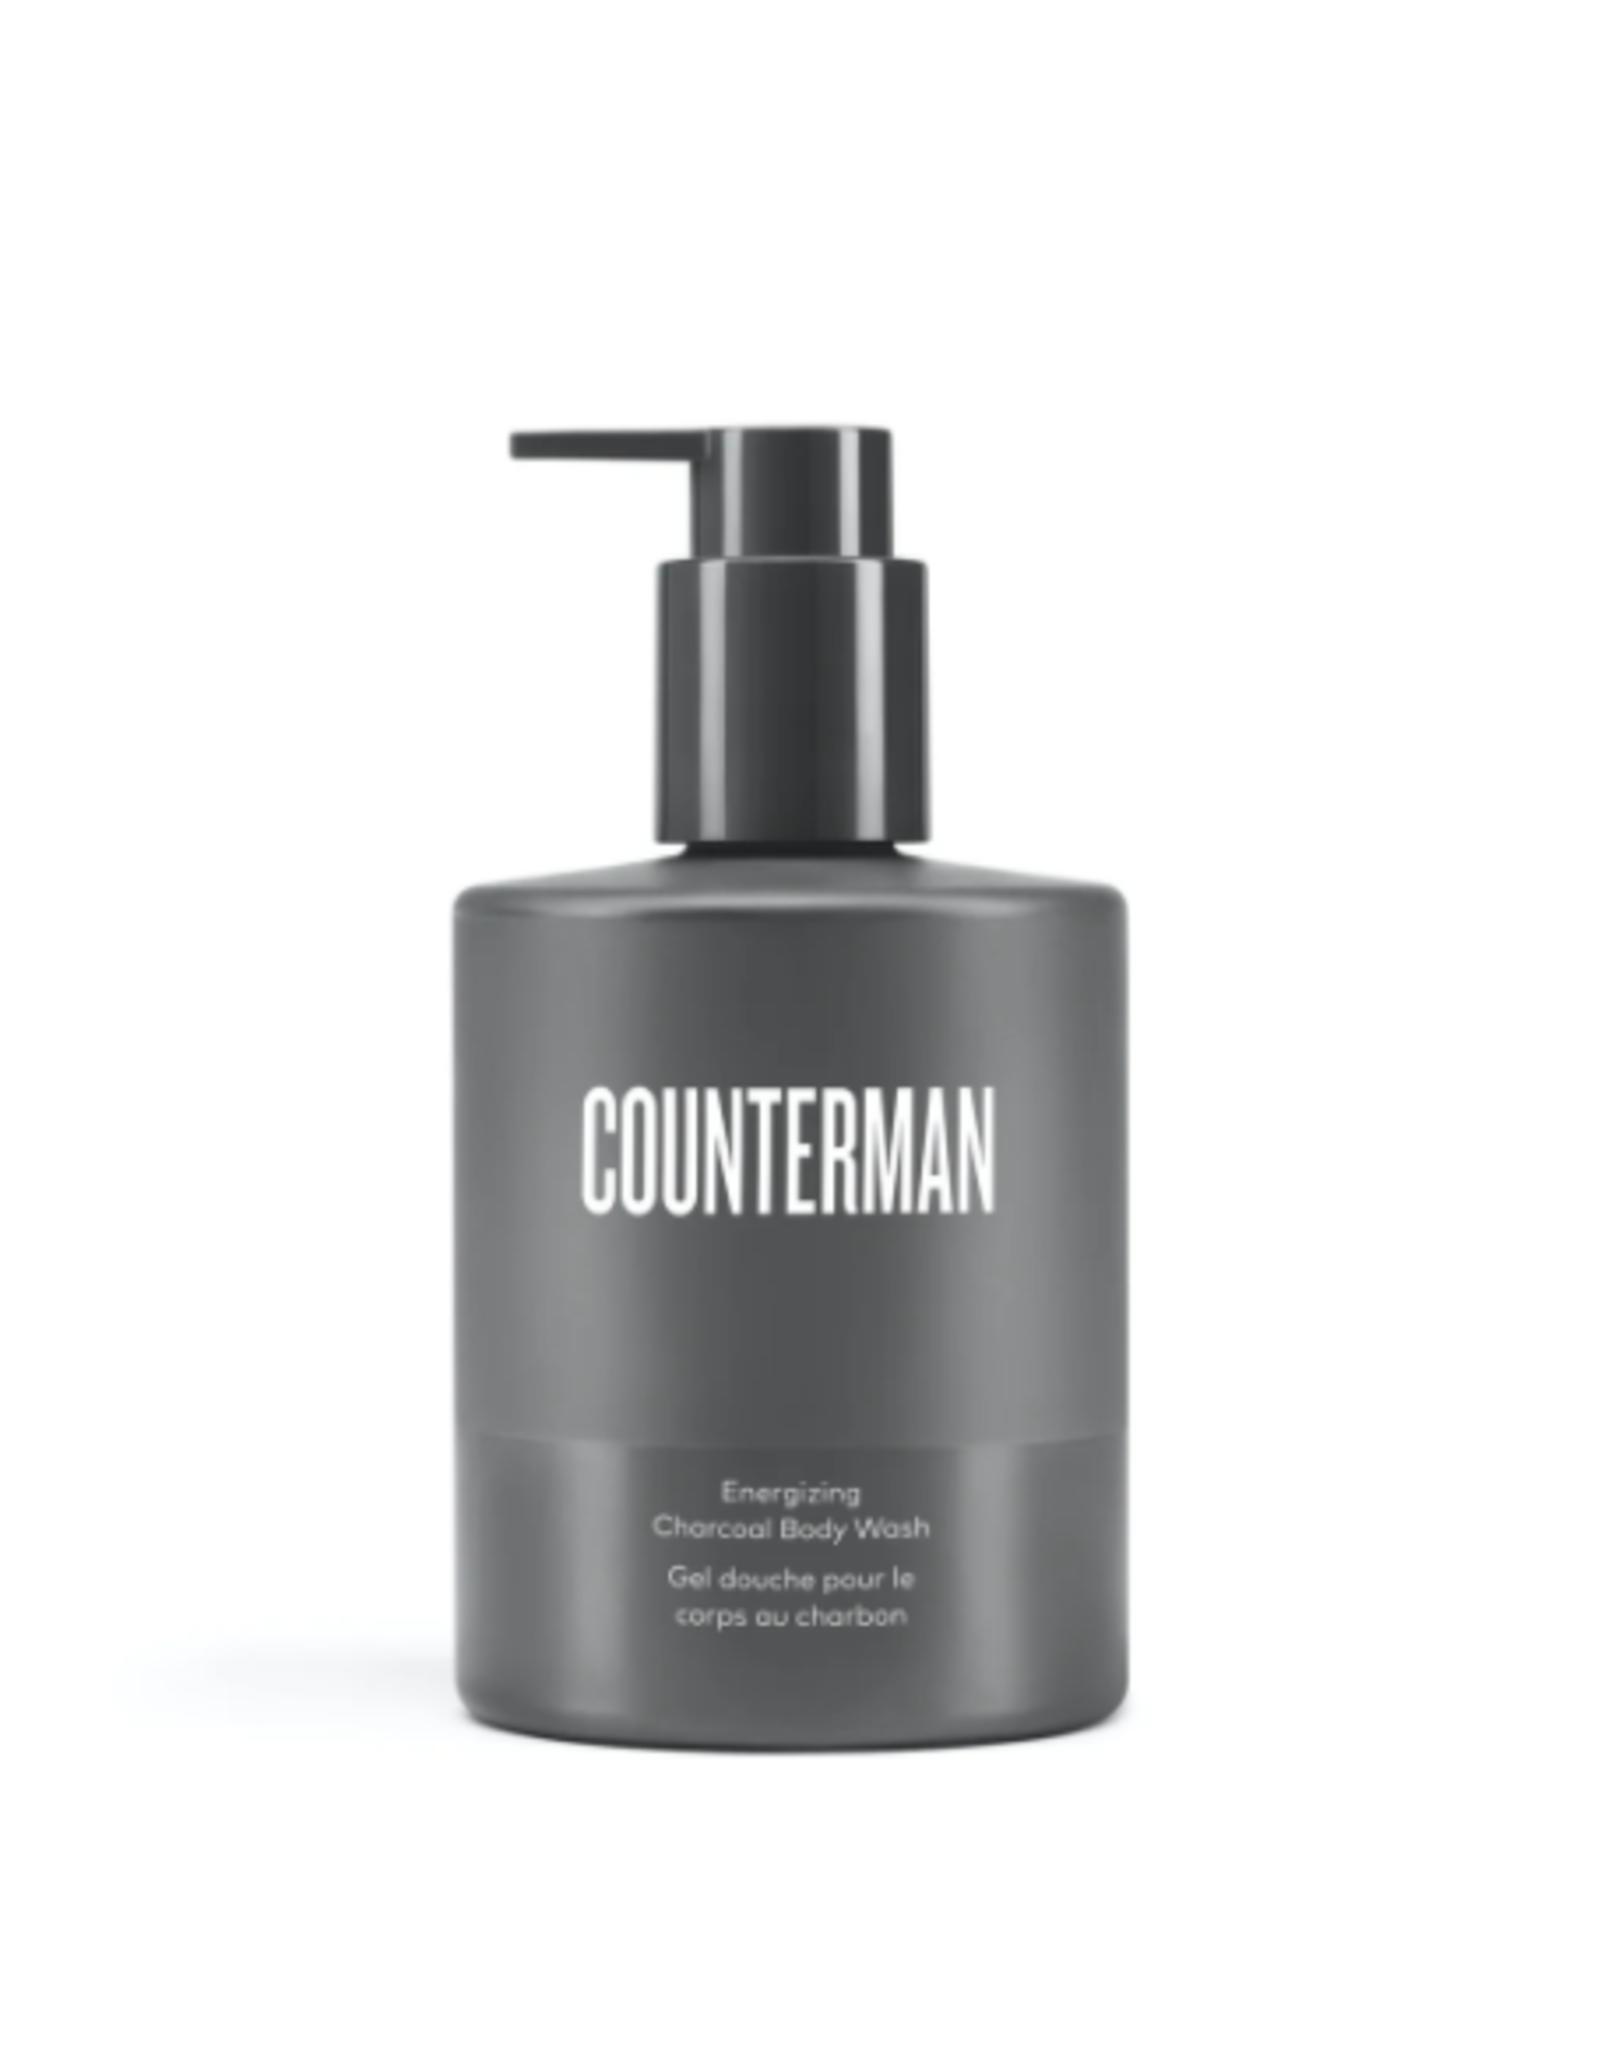 Counterman Energizing Charcoal Body Wash